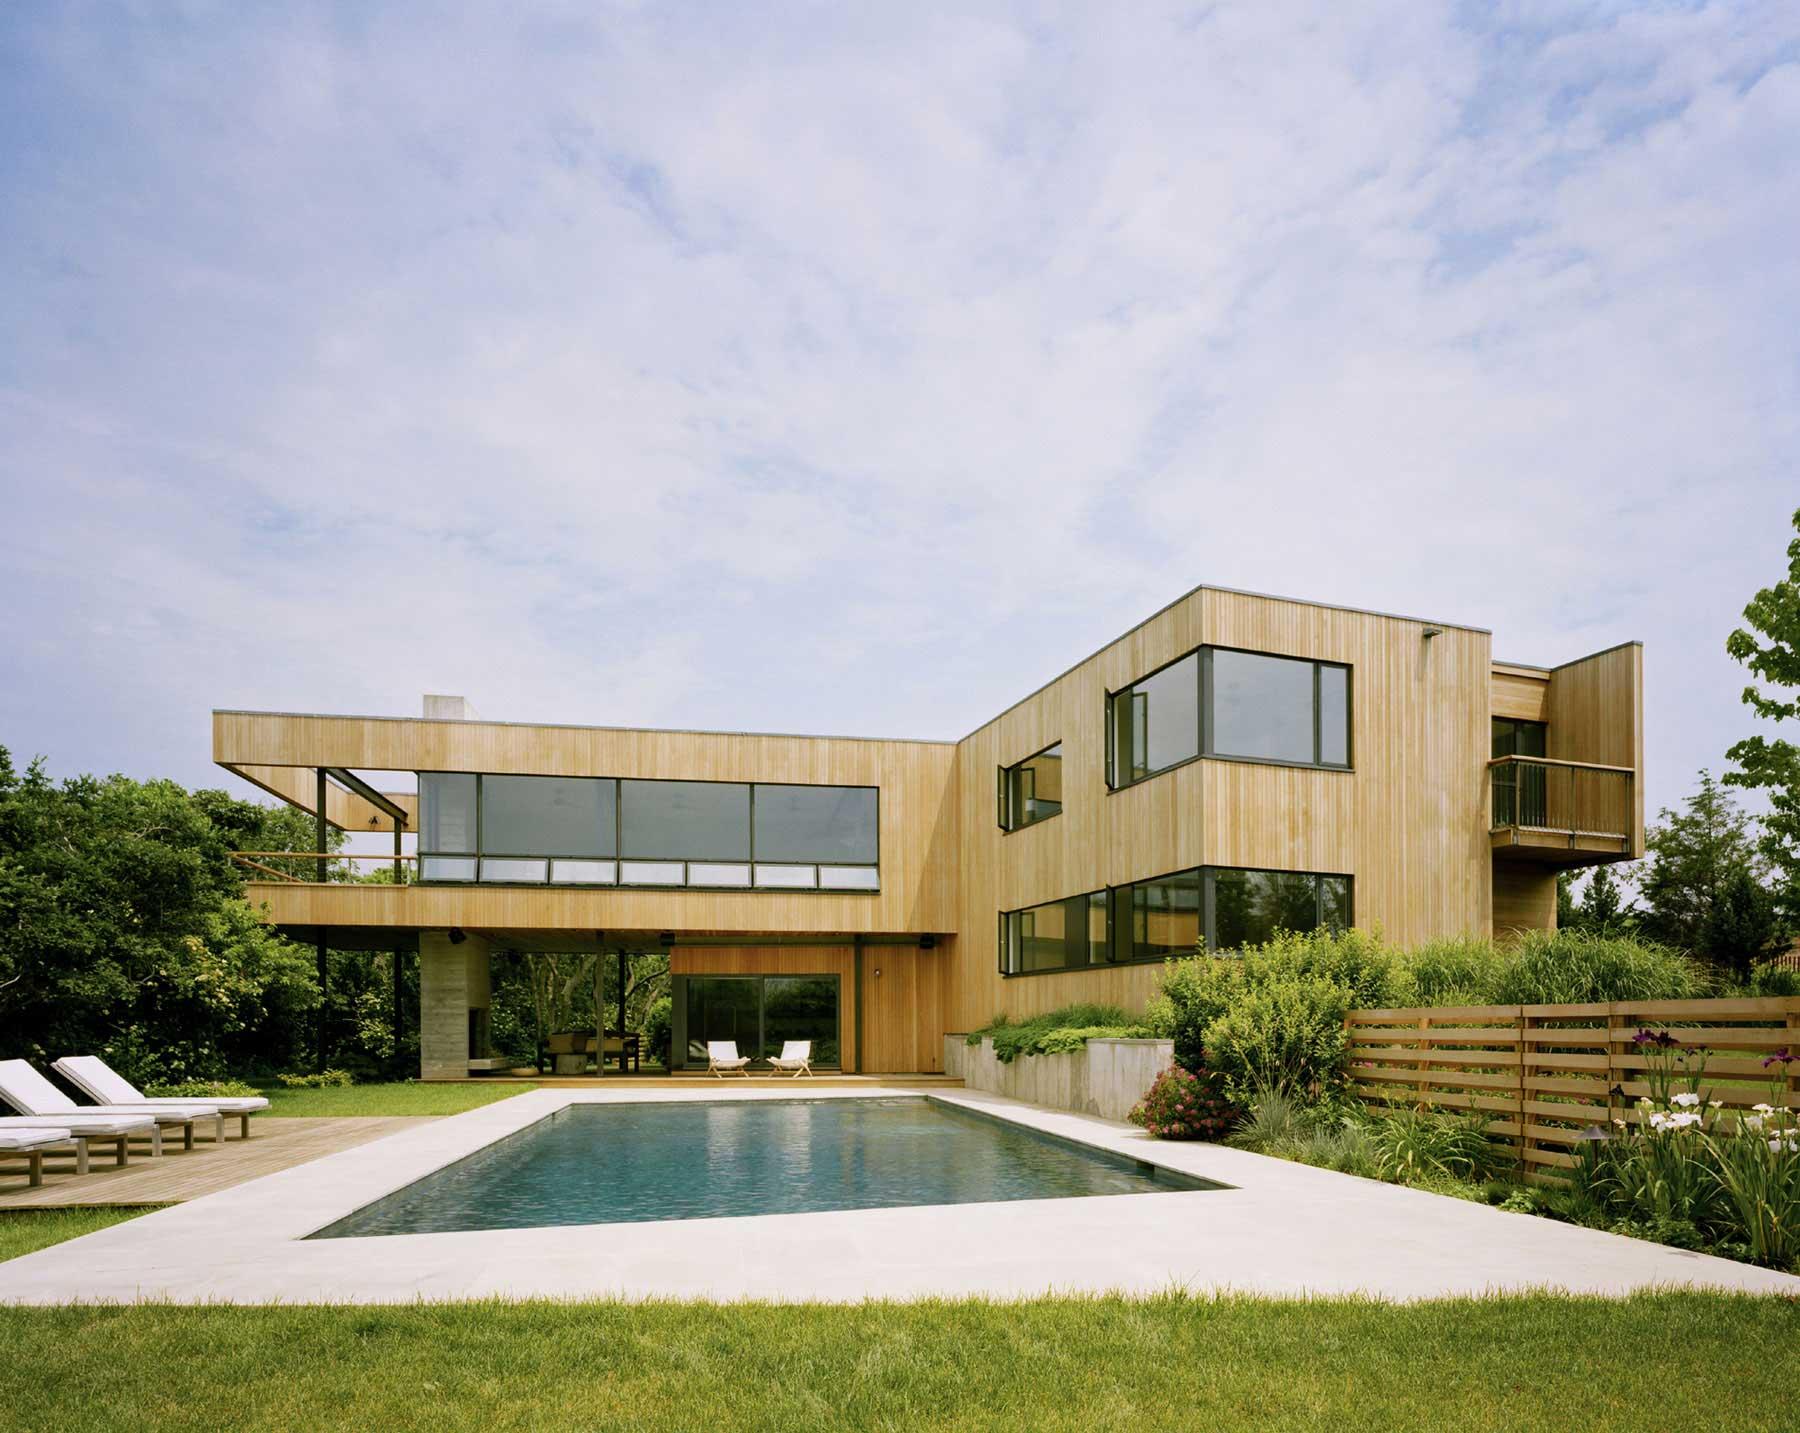 Maison contemporaine piscine for Maison moderne piscine